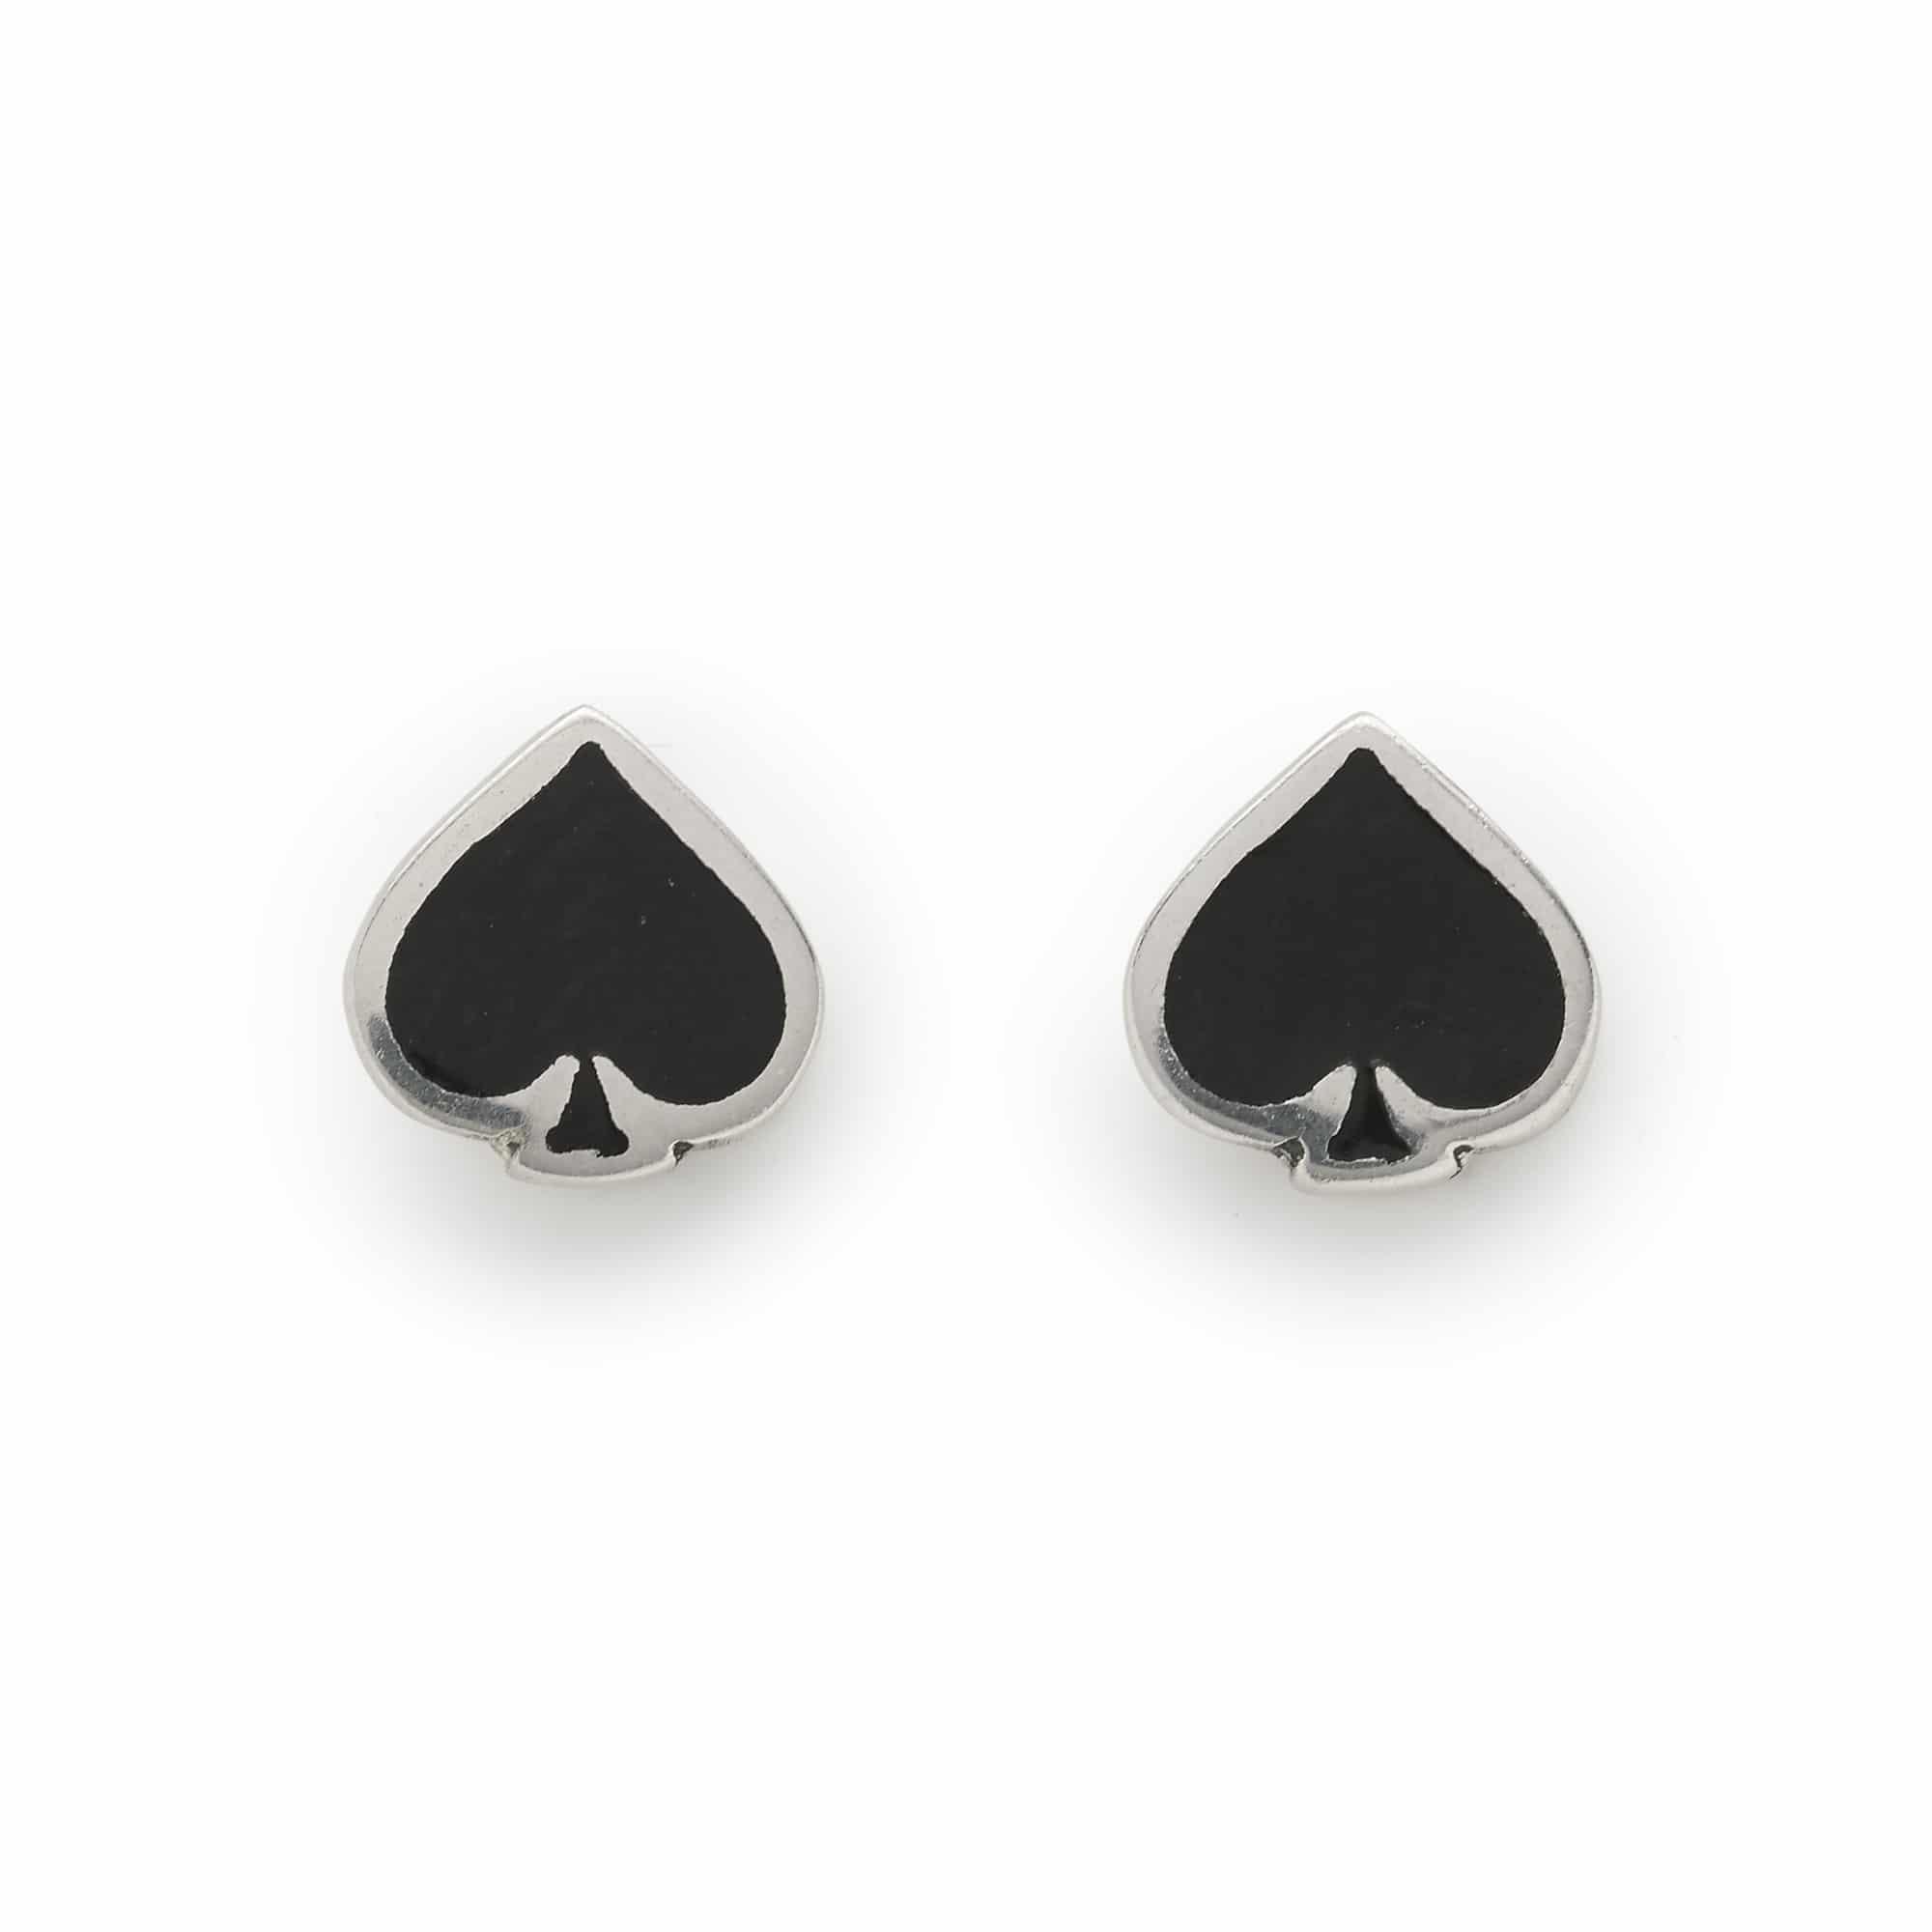 Sterling Silver Ace of Spades Stud Earrings G3hCHNBX